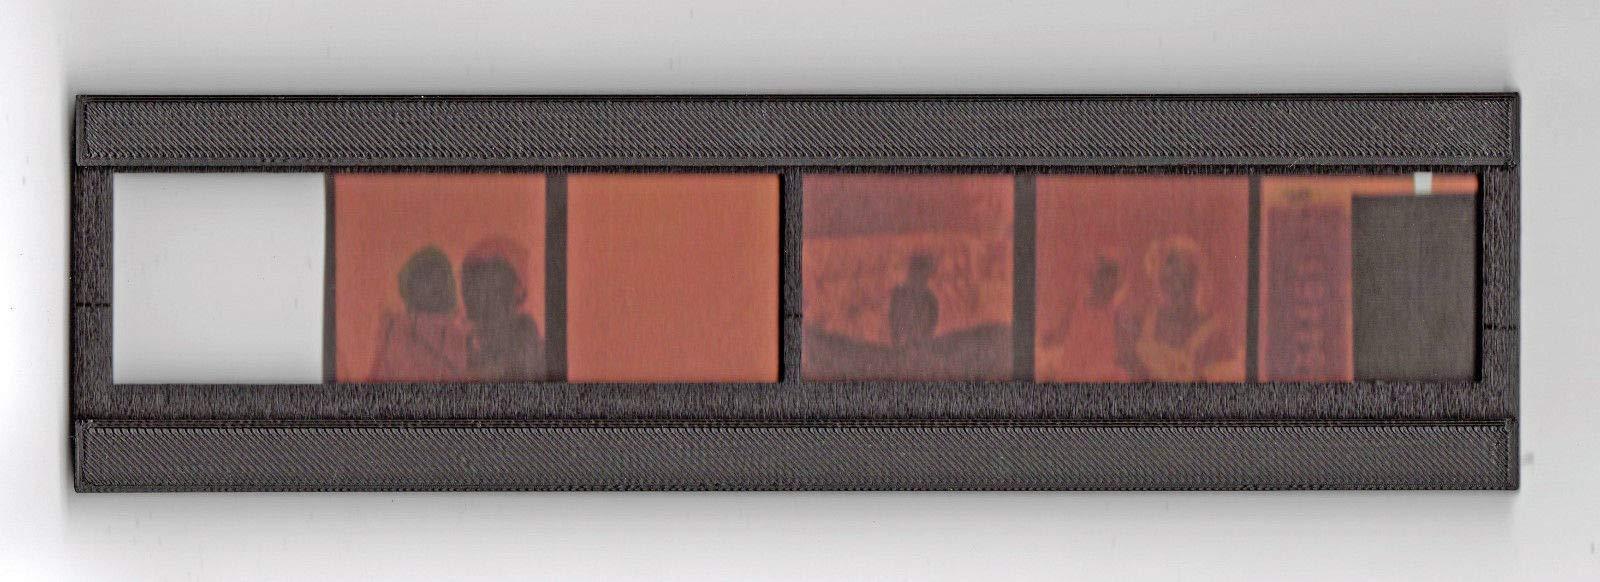 126 Negative Holder Compatible w/Epson Perfection V700/V750 Film scanners